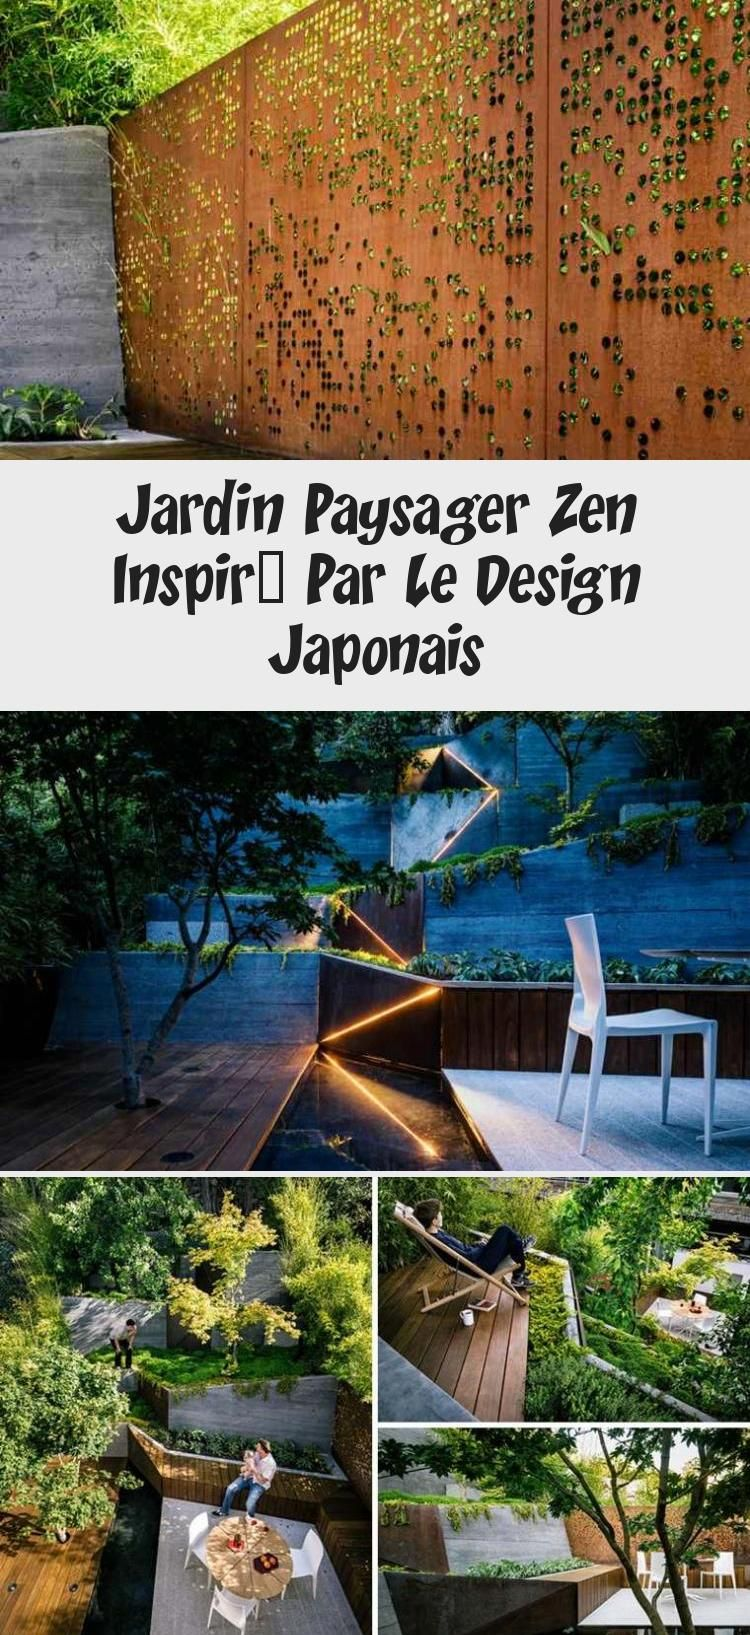 #Jardins et terrasses Jardin paysager zen inspiré par le design japonais #Jardin #paysager #zen #inspiré #par #le #design #japonais #Landschaftsgarten #landschaftsgarten